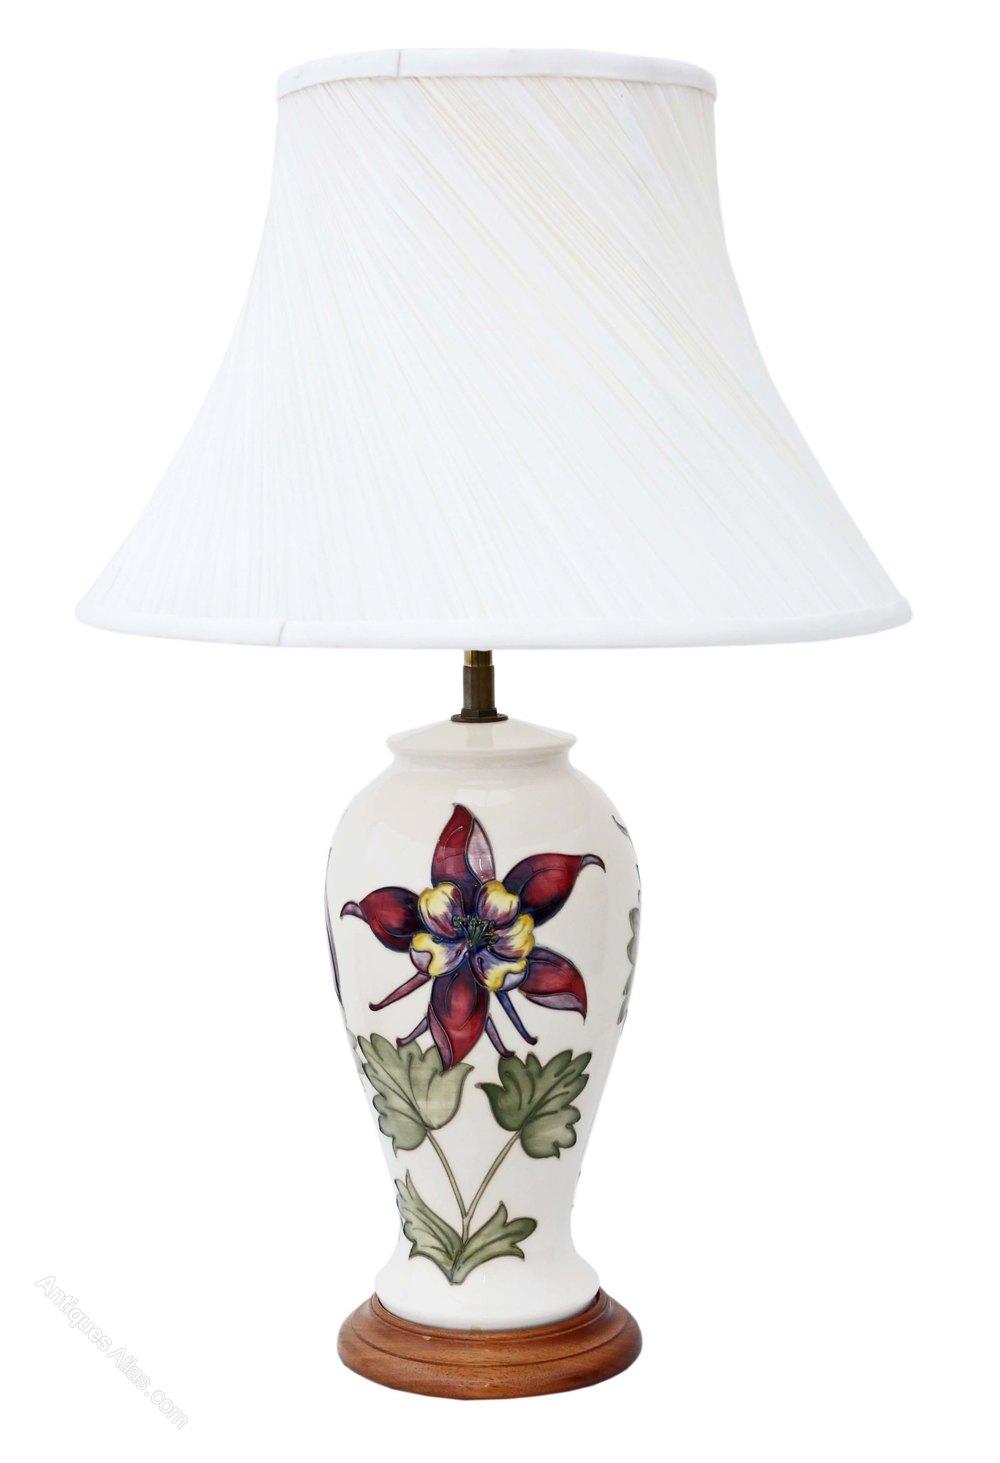 Antiques atlas moorcroft ceramic table lamp with shade table lamps moorcroft ceramic table alt5 alt6 aloadofball Images